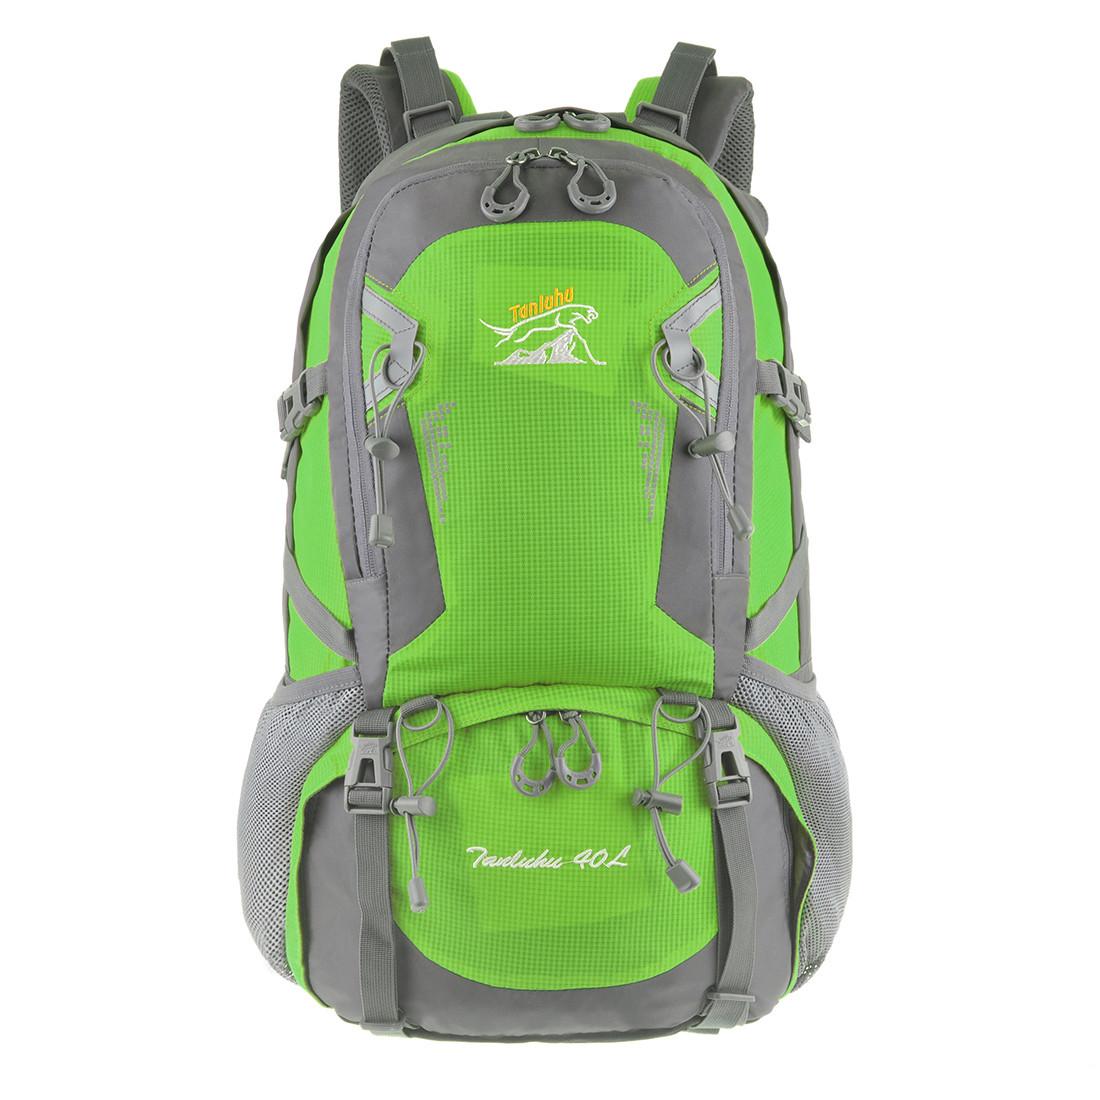 Рюкзак туристический TANLUHU 50х32х22 зелёный 40 л Polyester Oxford Rip Stop PU 600D/1600D   кс631зел